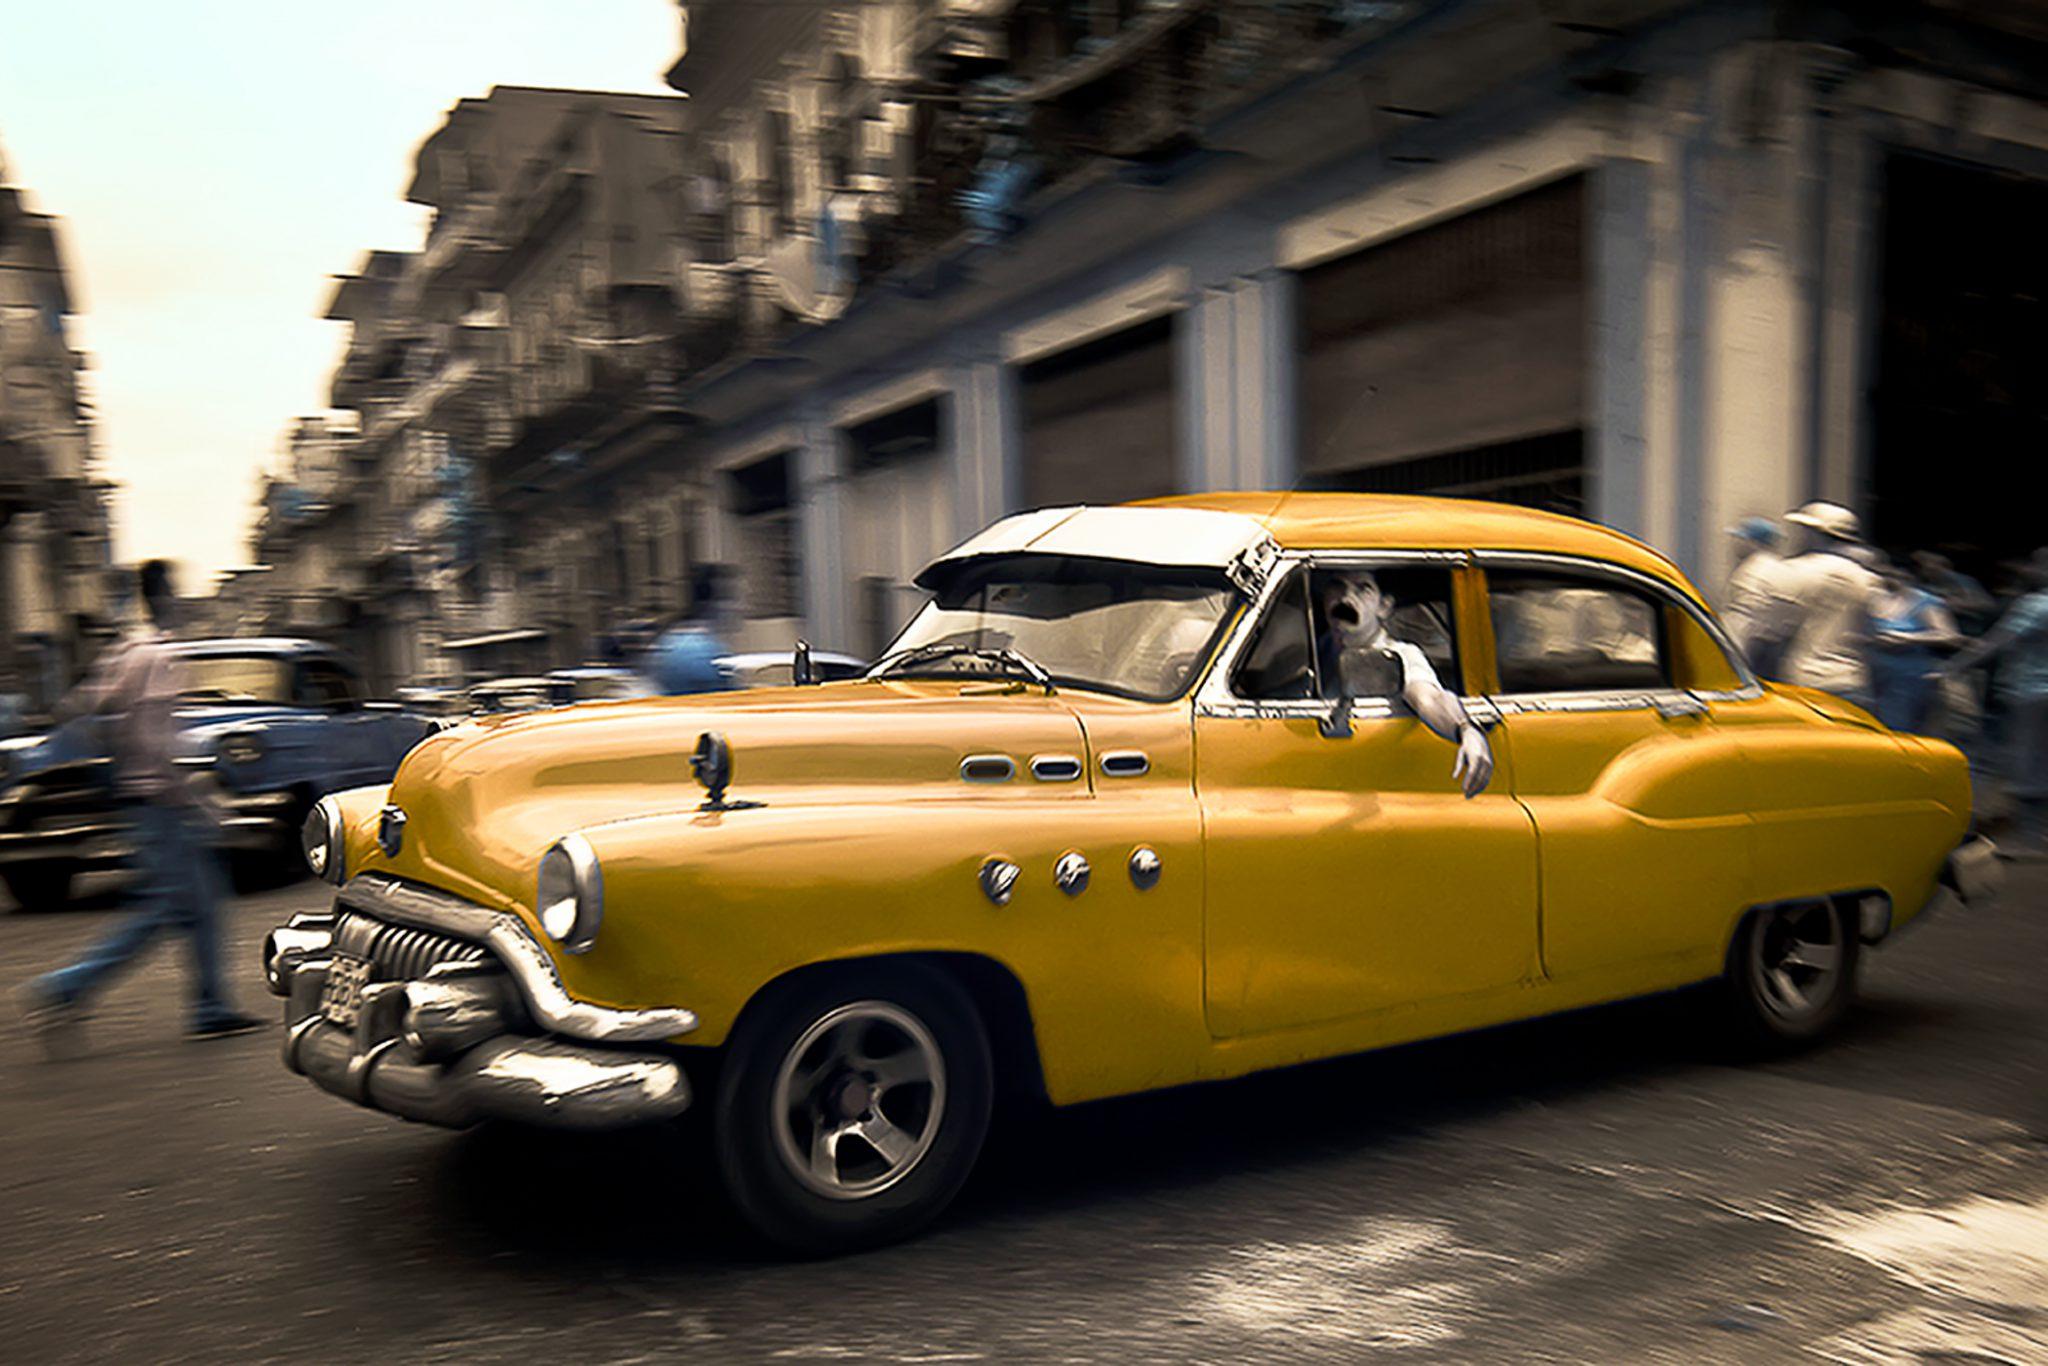 Cuban Turn Signal '15 © EK Waller